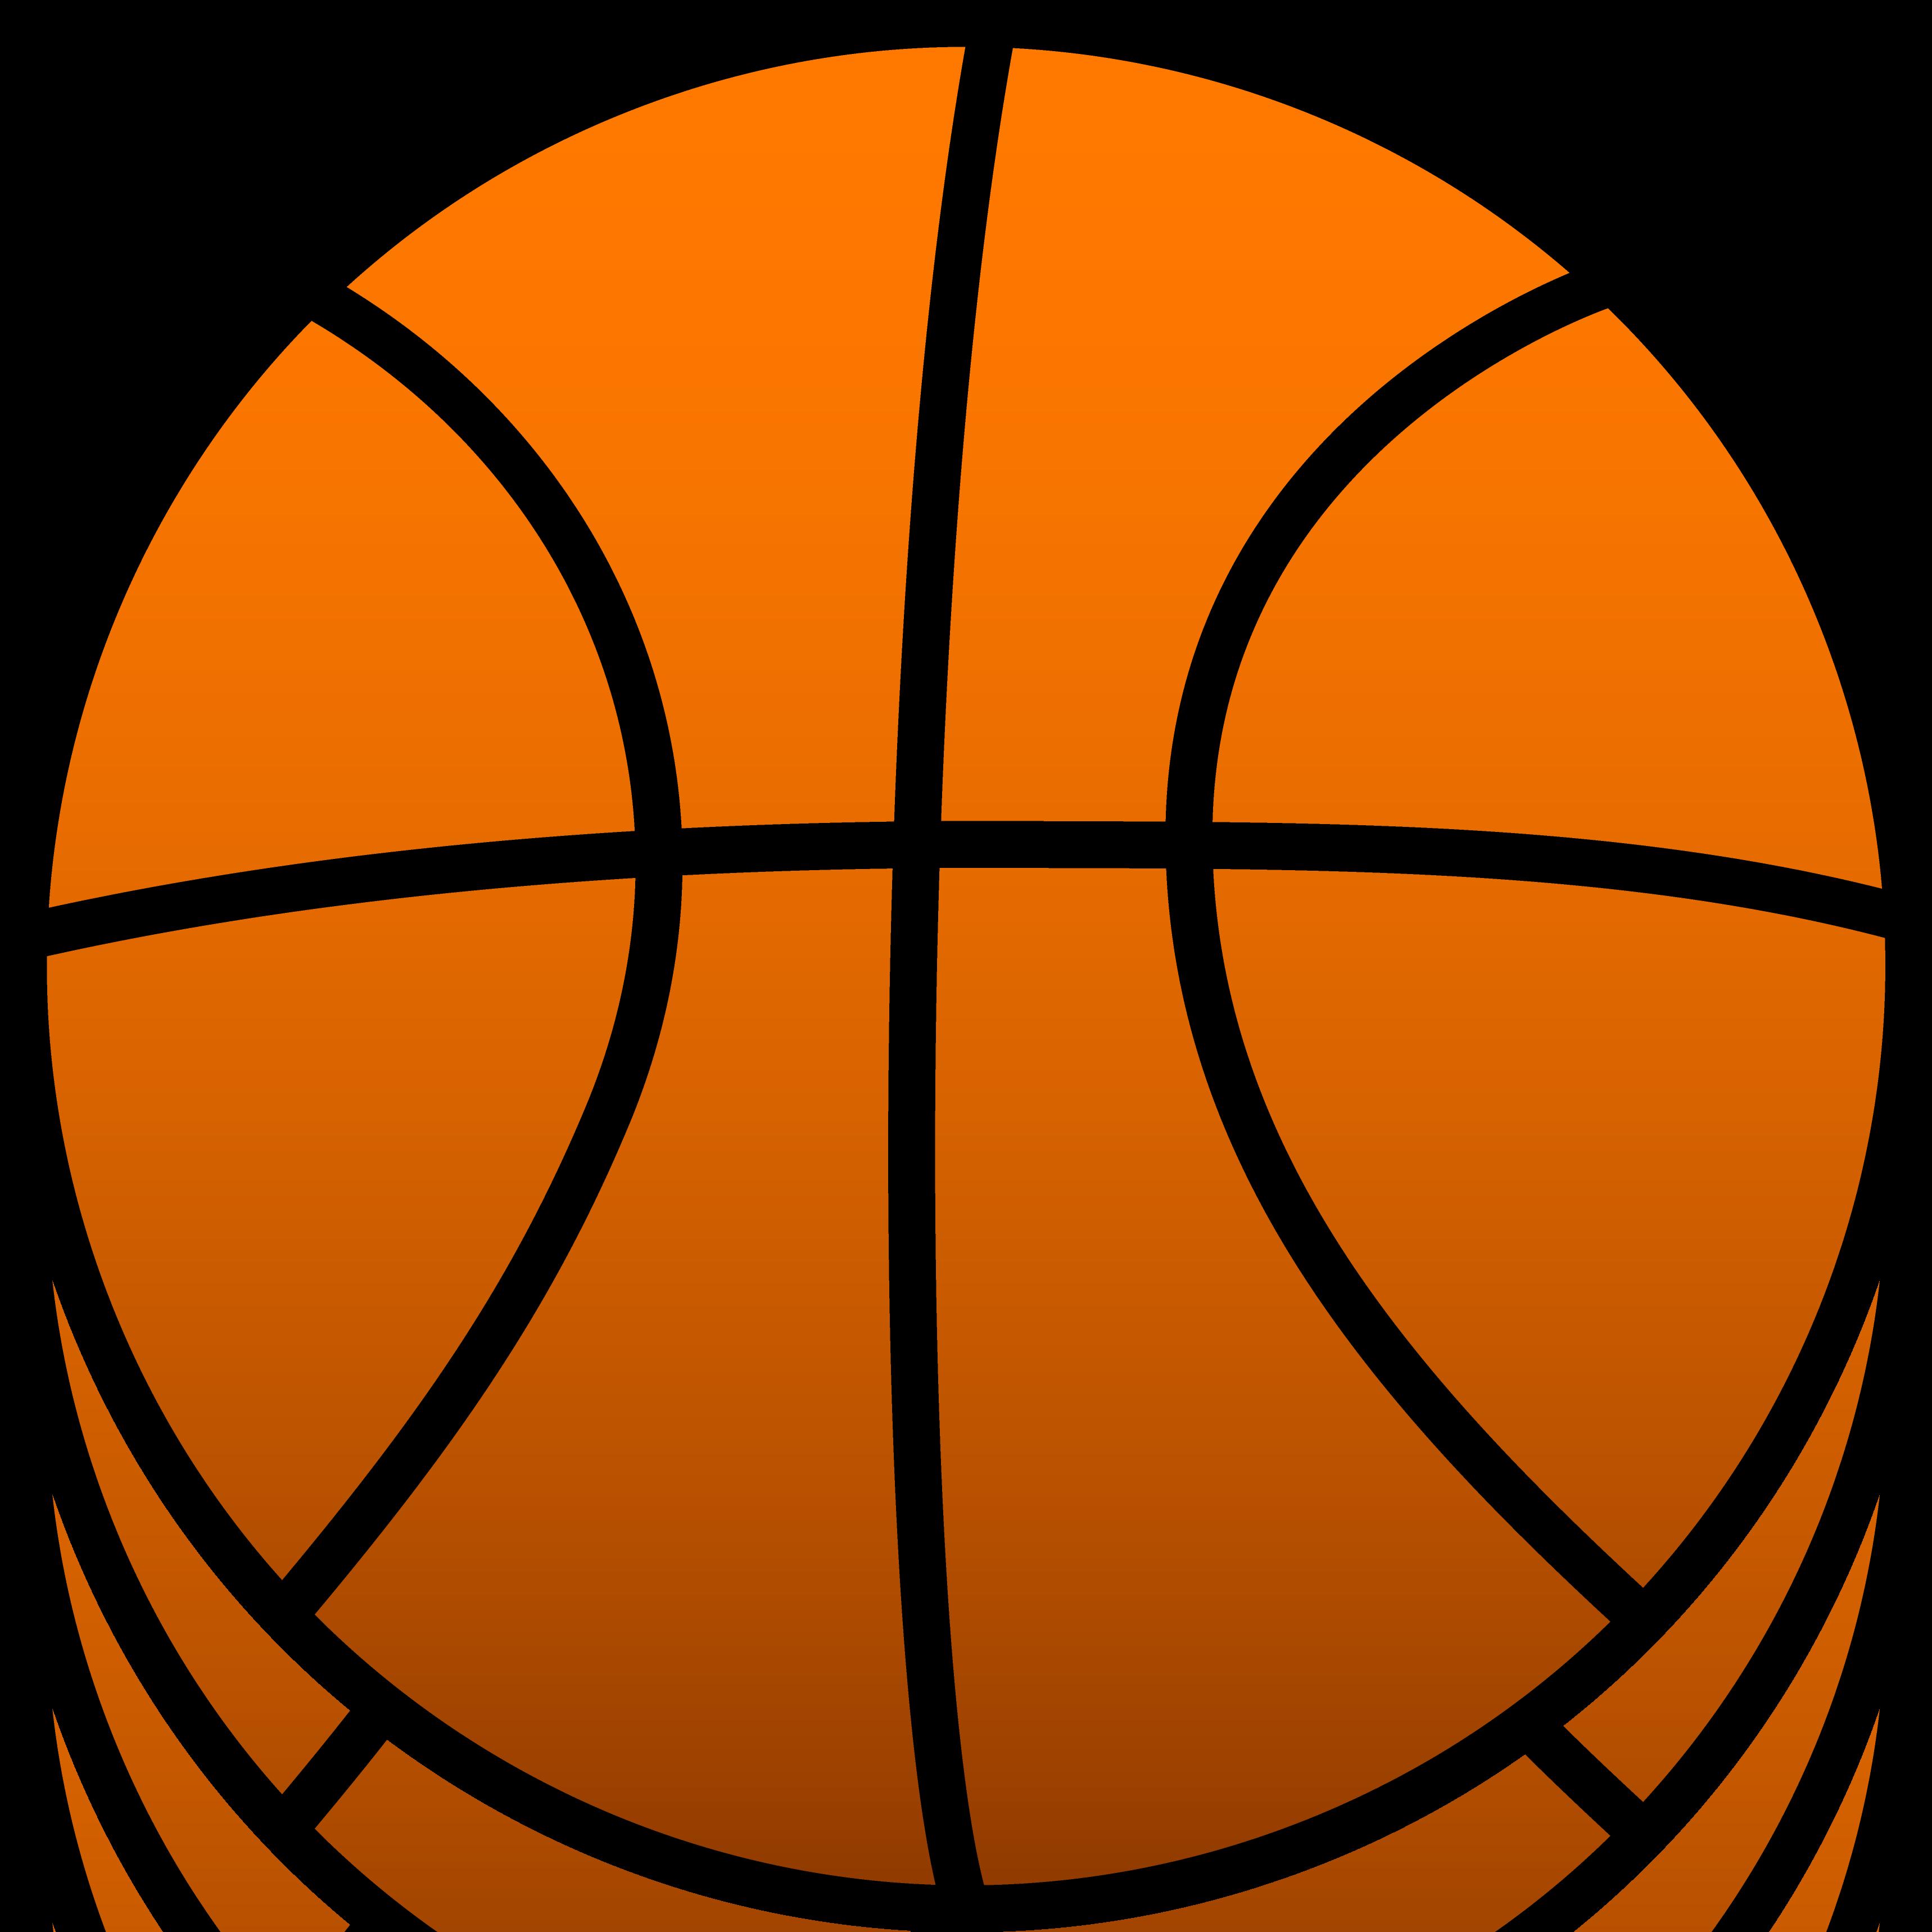 3437x3437 Simple Orange Sports Basketball